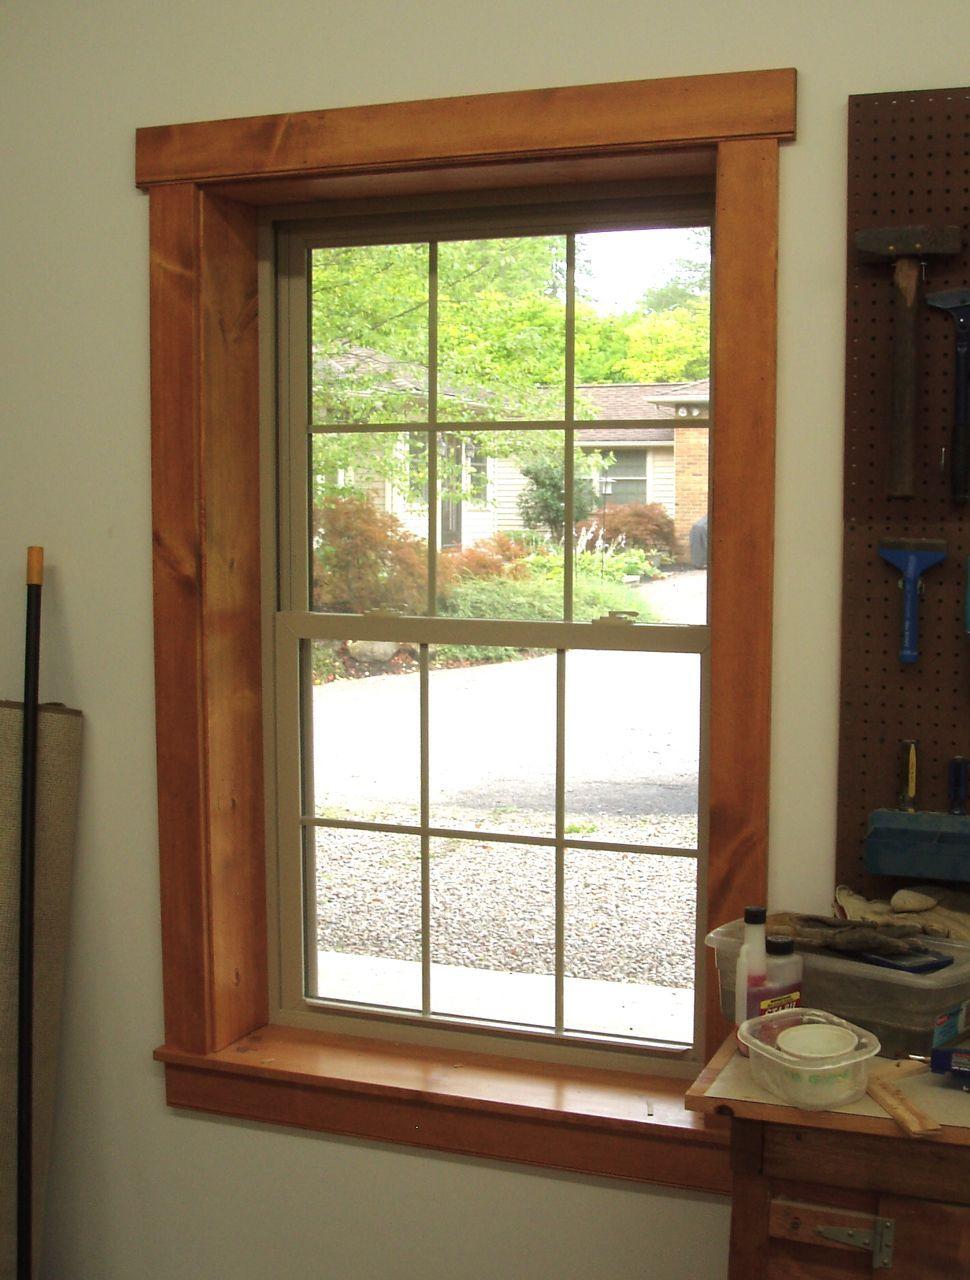 Attachment Php 970 1 280 Pixels Interior Window Trim Farmhouse Window Trim Rustic Window